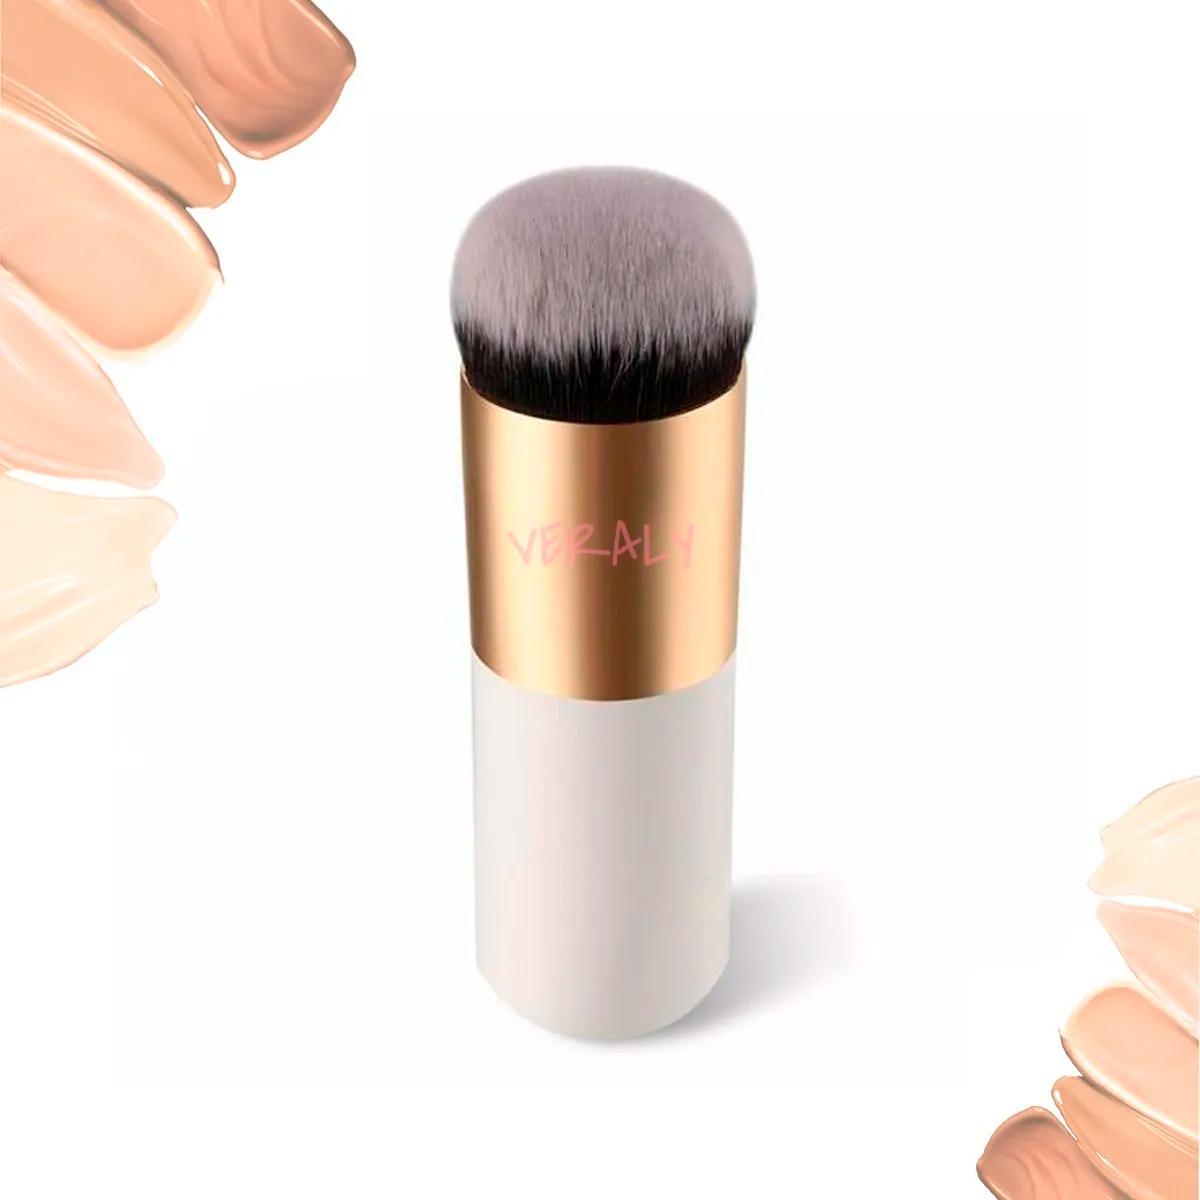 Brocha Kabuki Maquillaje Mineral, Compacta